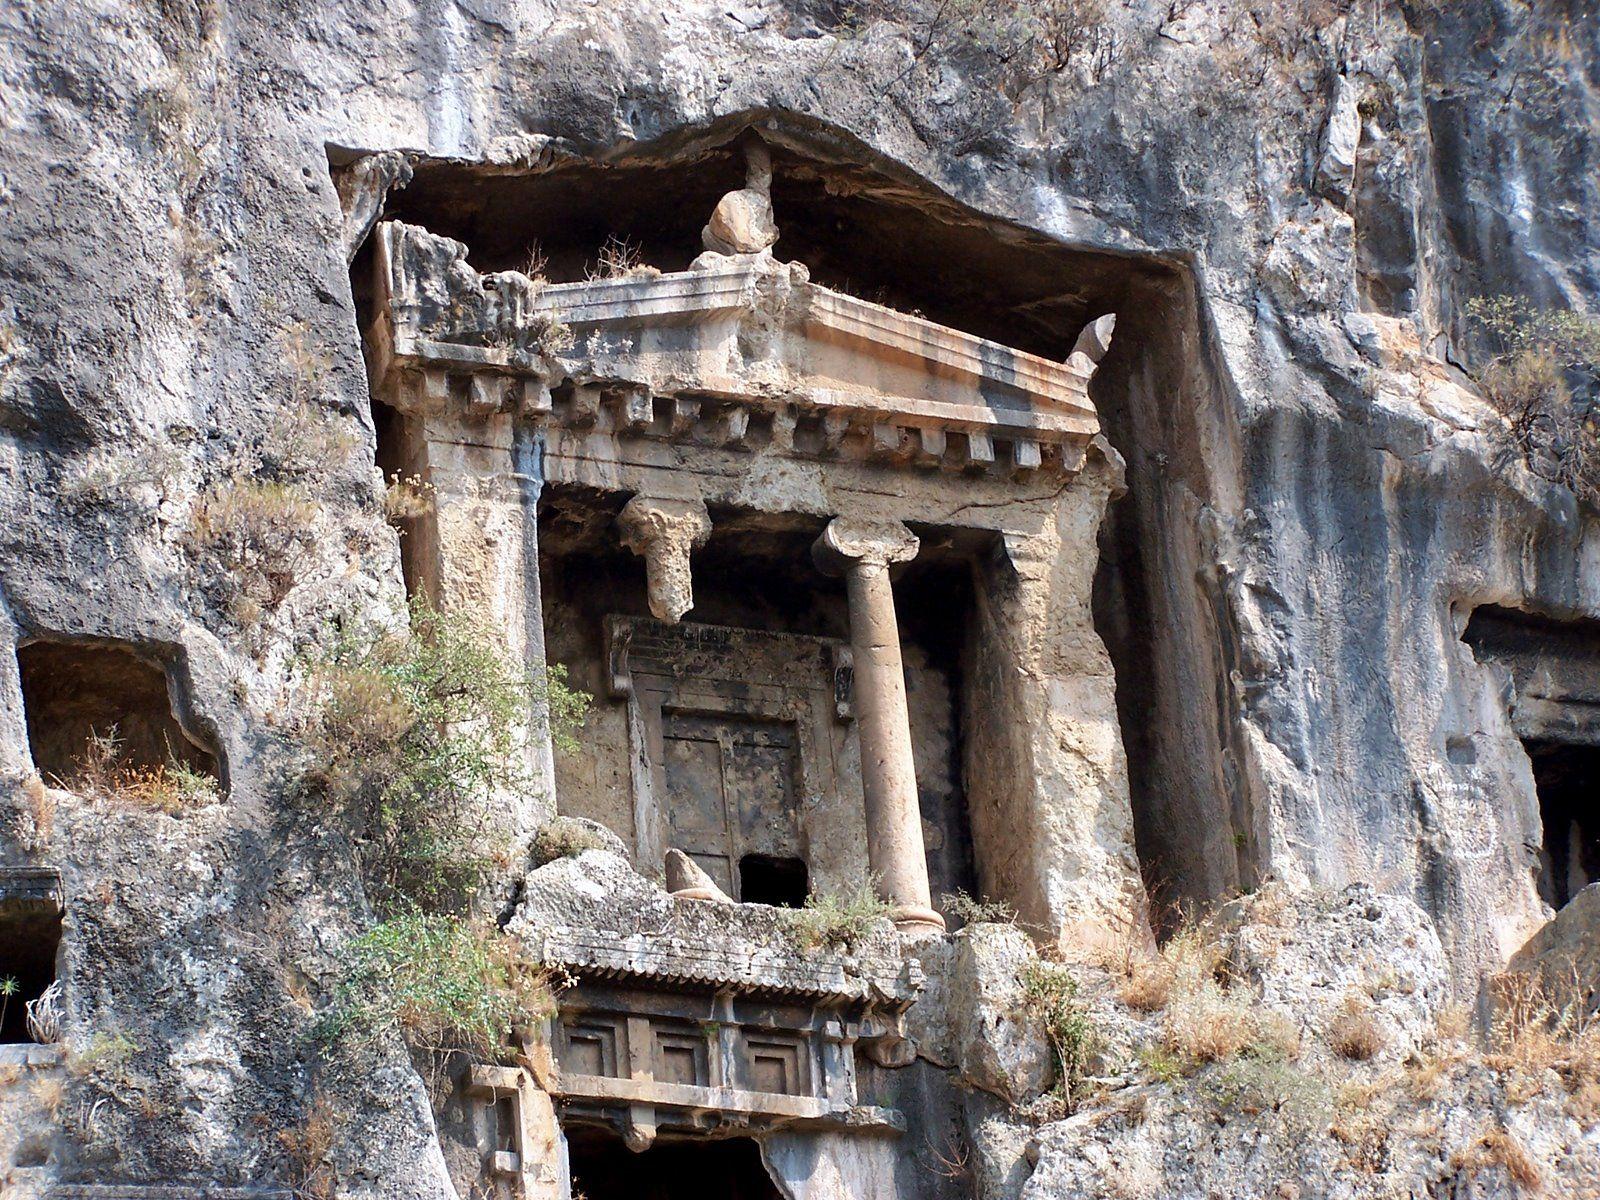 http://www.farhorizons.com/trips/europe/turkishtreasures/TurkishTreasures.php #archaeology #turkey